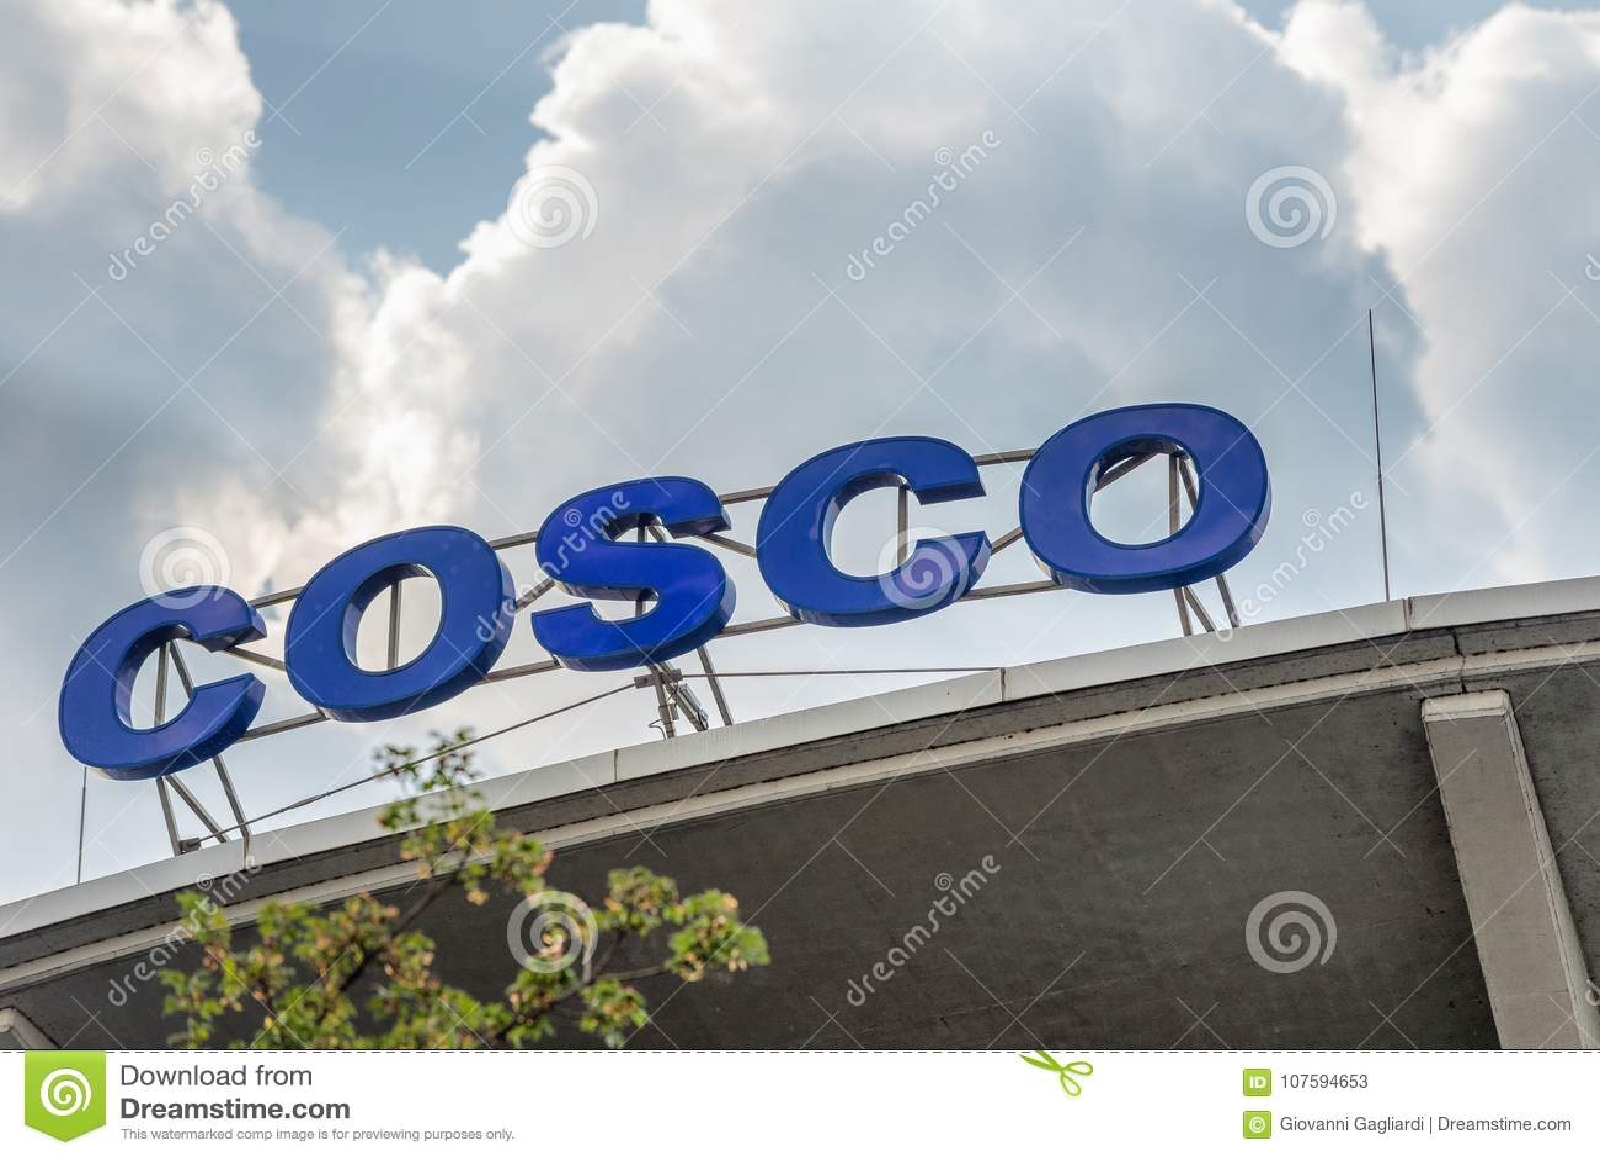 HAMBURG, GERMANY - JULY 20, 2016: Cosco Sign On A City Mall